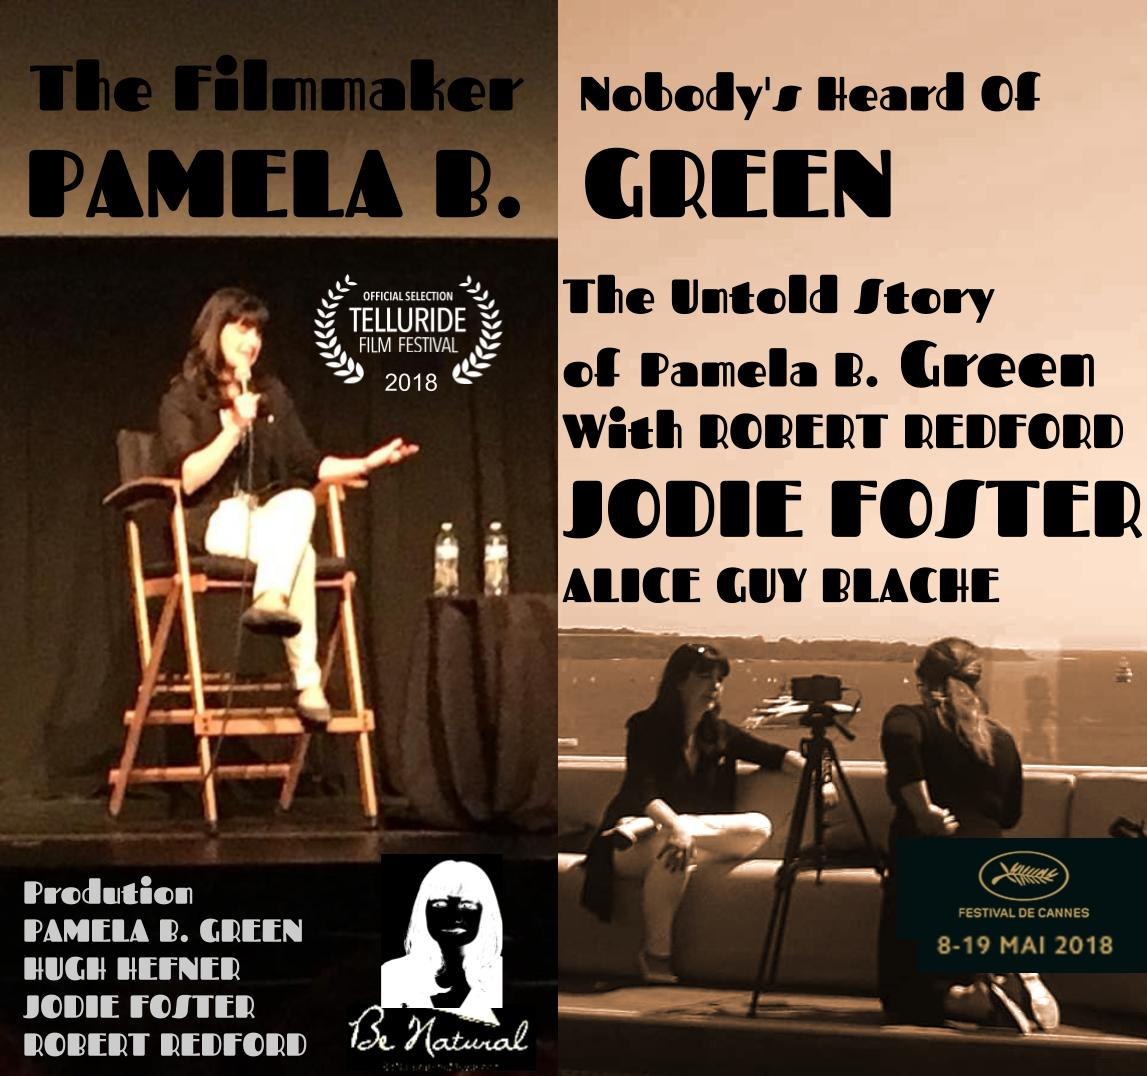 The Untold Story of Pamela B Green with Robert Redford, Pamela B, Green, Jodie Foster, Alice Guy Bl